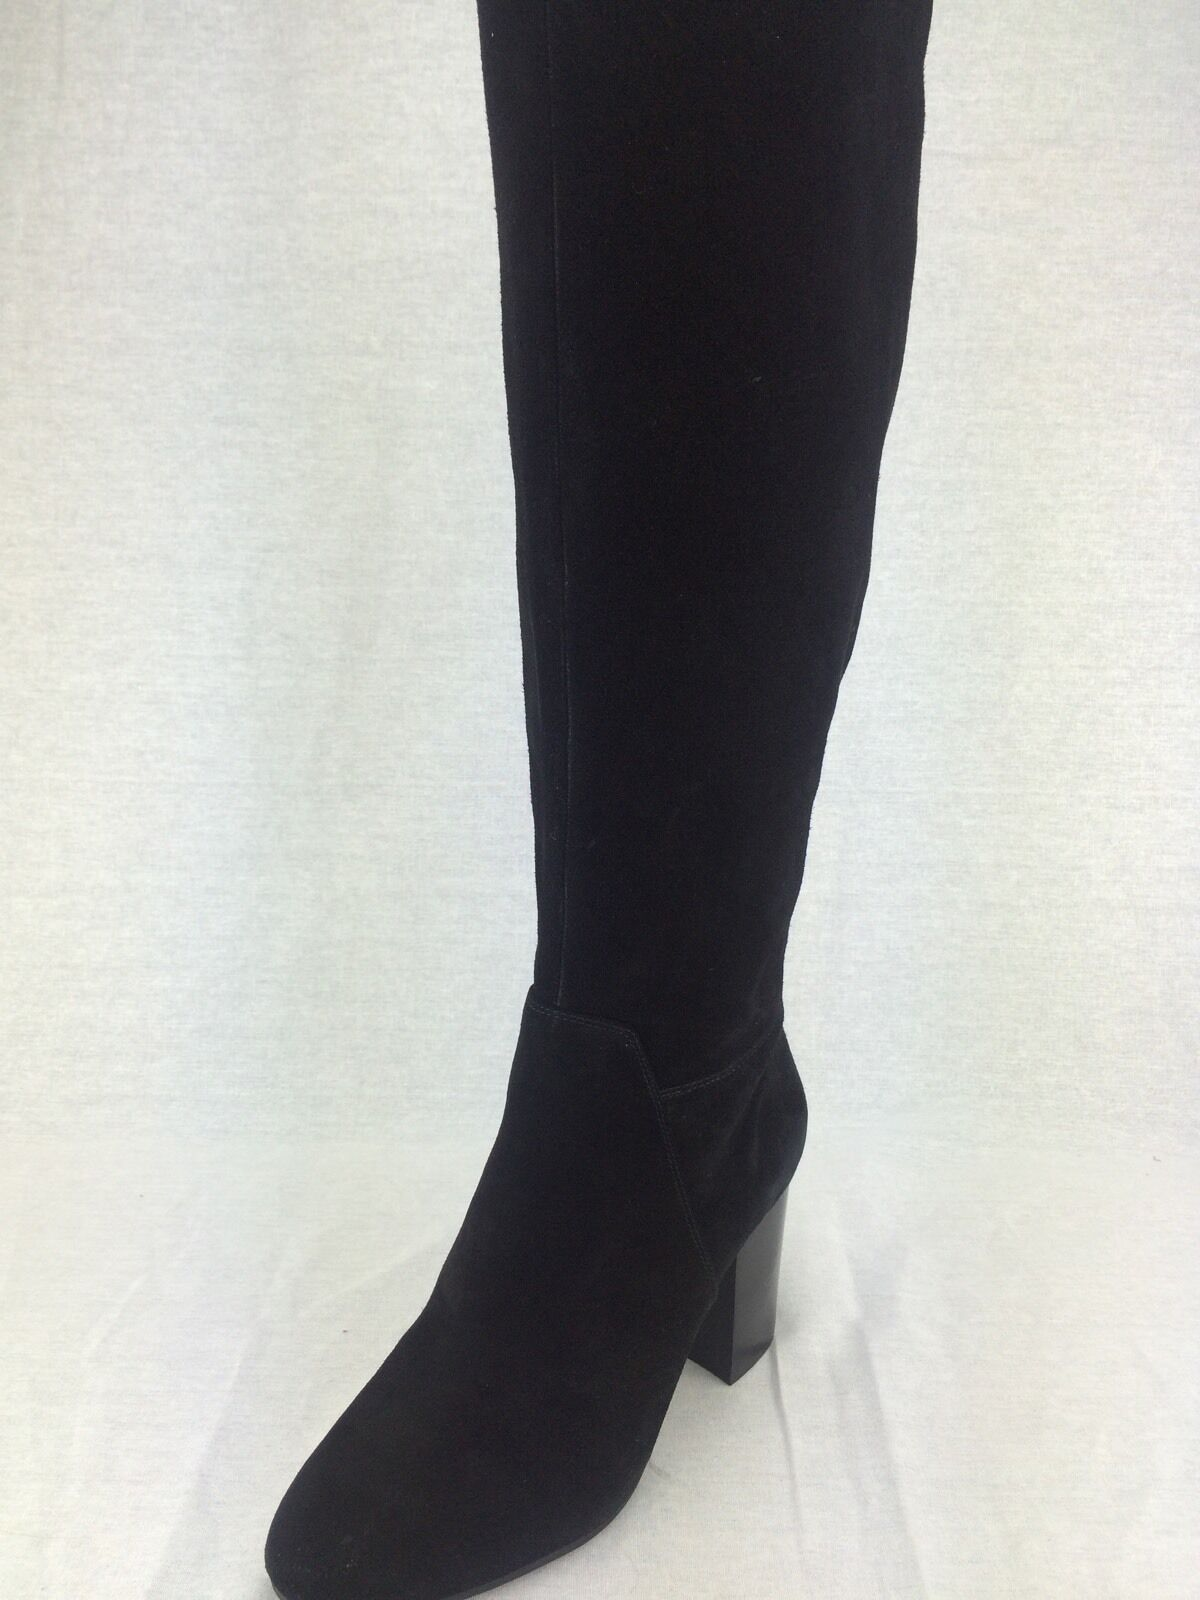 Vince Camuto Sashe Women's High Shaft Heel Boots,Black Verona ,New,6M, 0299